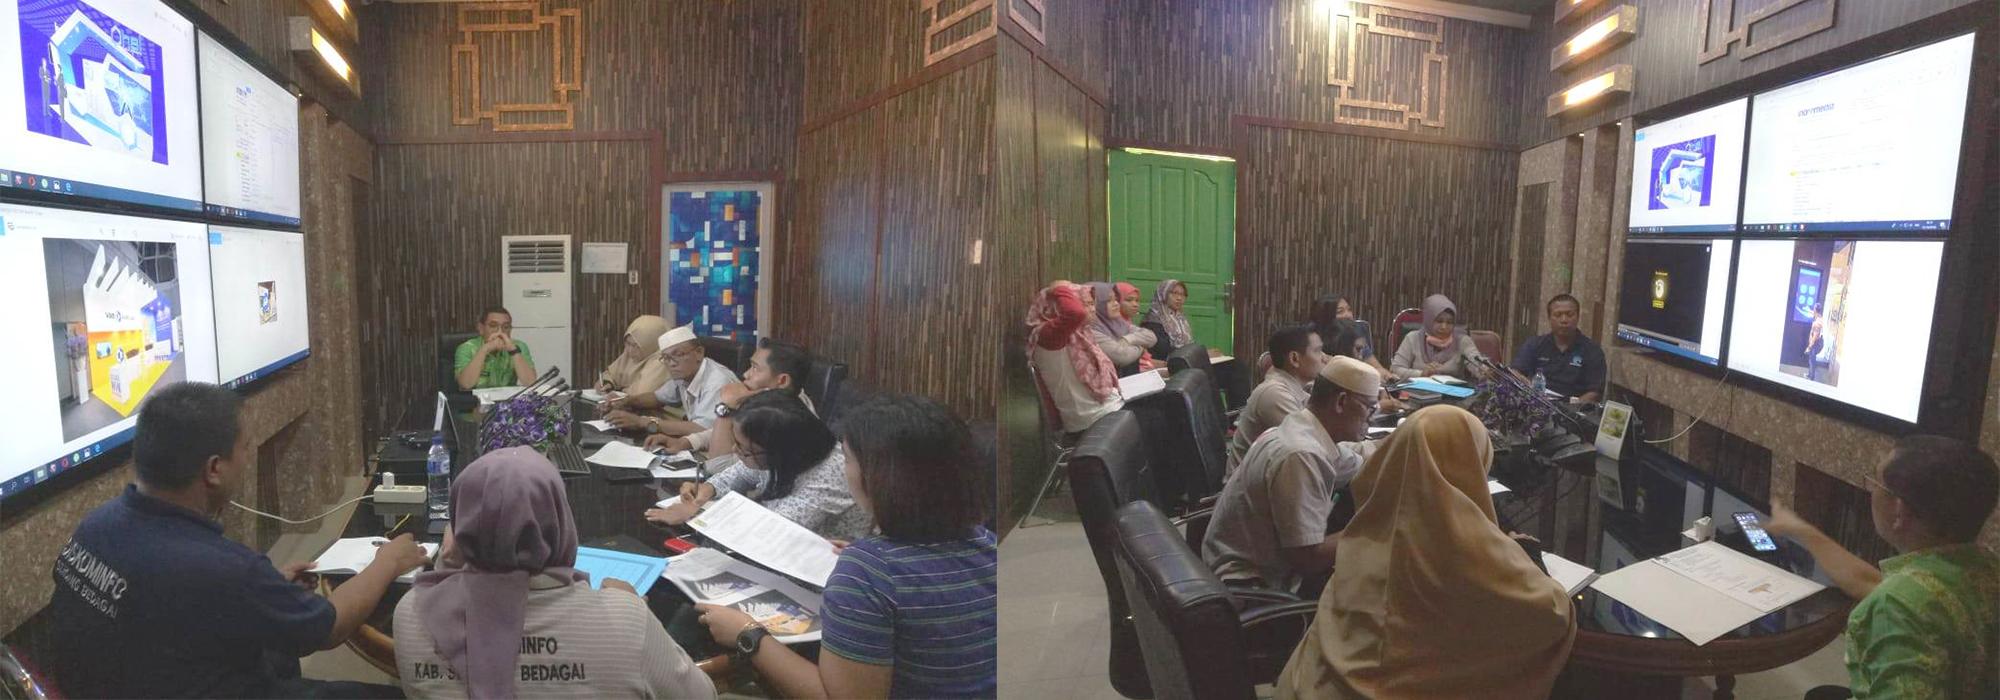 Dinas Kominfo Rapat Persiapan HUT Sergai ke-15 Tahun 2019